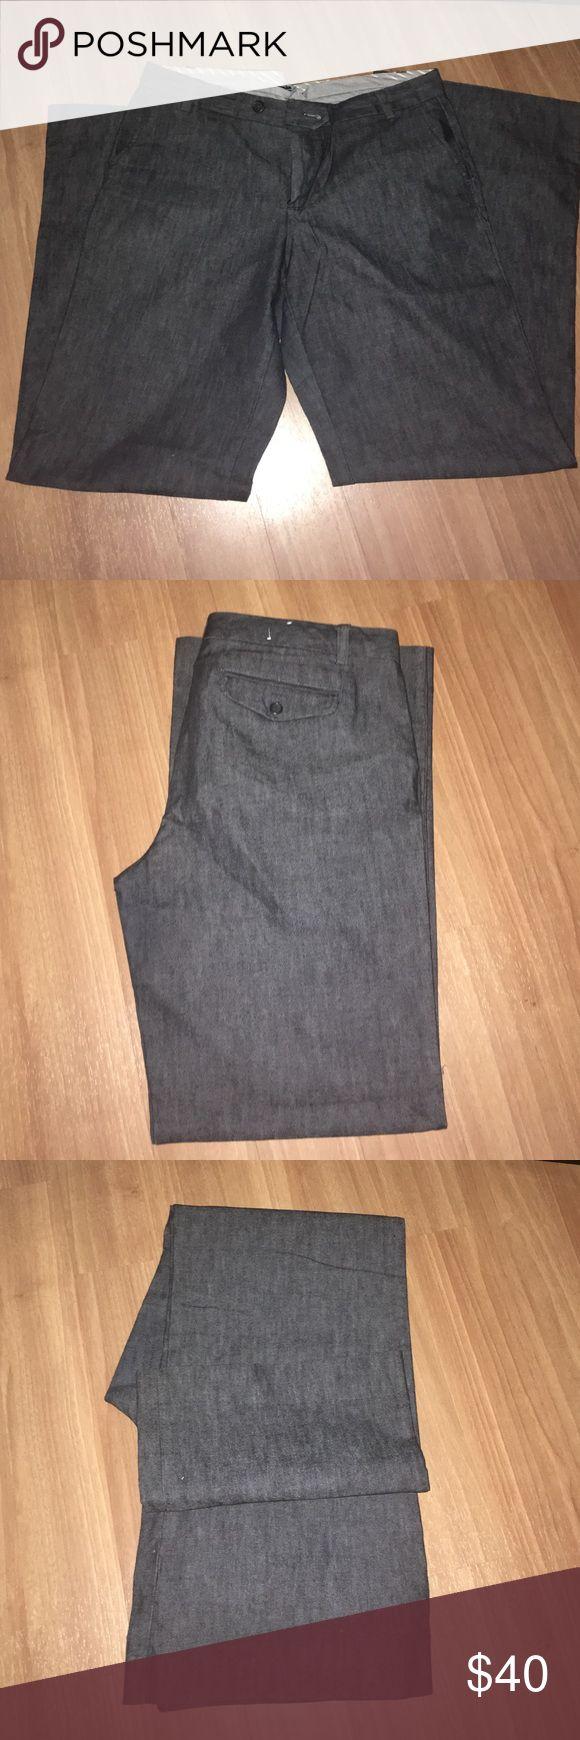 ‼️SALE‼️Gap wide leg stretch jeans Gap wide leg stretch jeans brand new never worn without tag. GAP Jeans Flare & Wide Leg